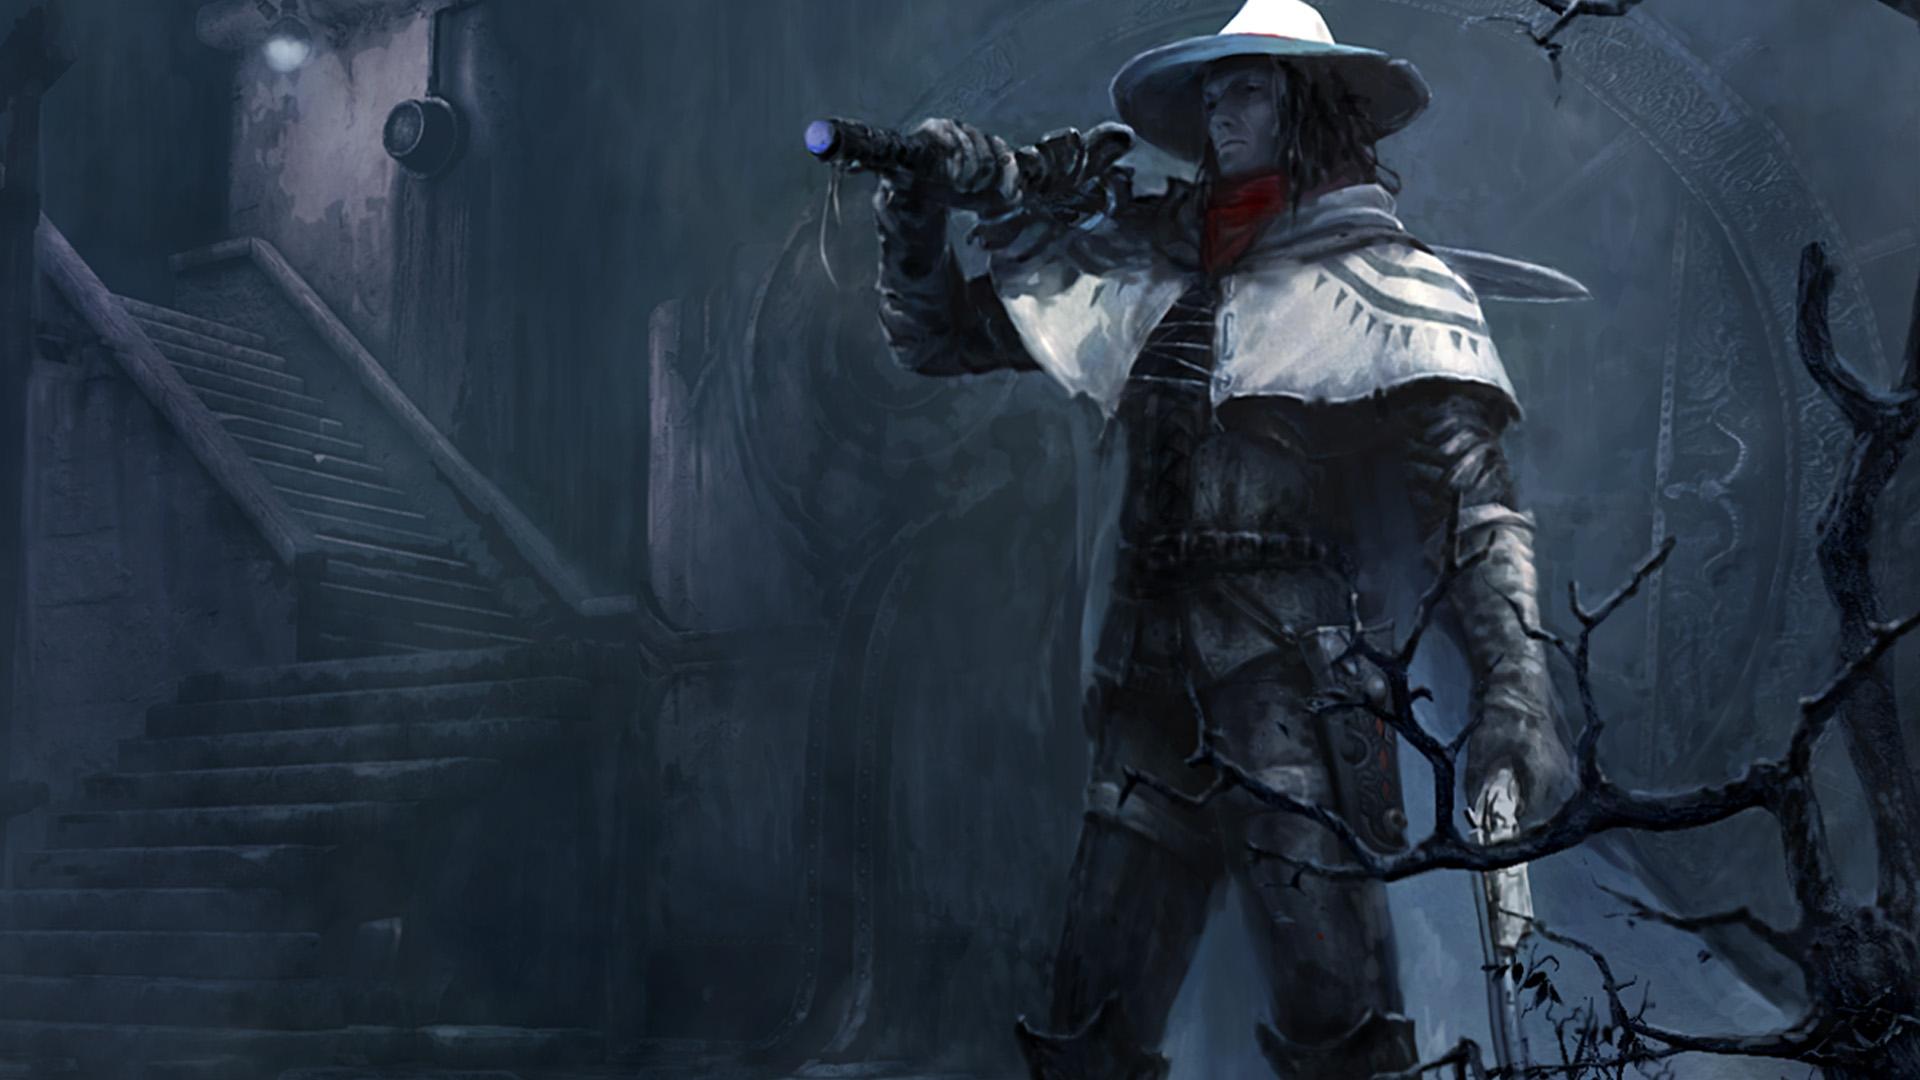 d7cda83a28ddfb6b3a8c868ffb9ea17e4d0a1c64.jpg - Incredible Adventures of Van Helsing, the